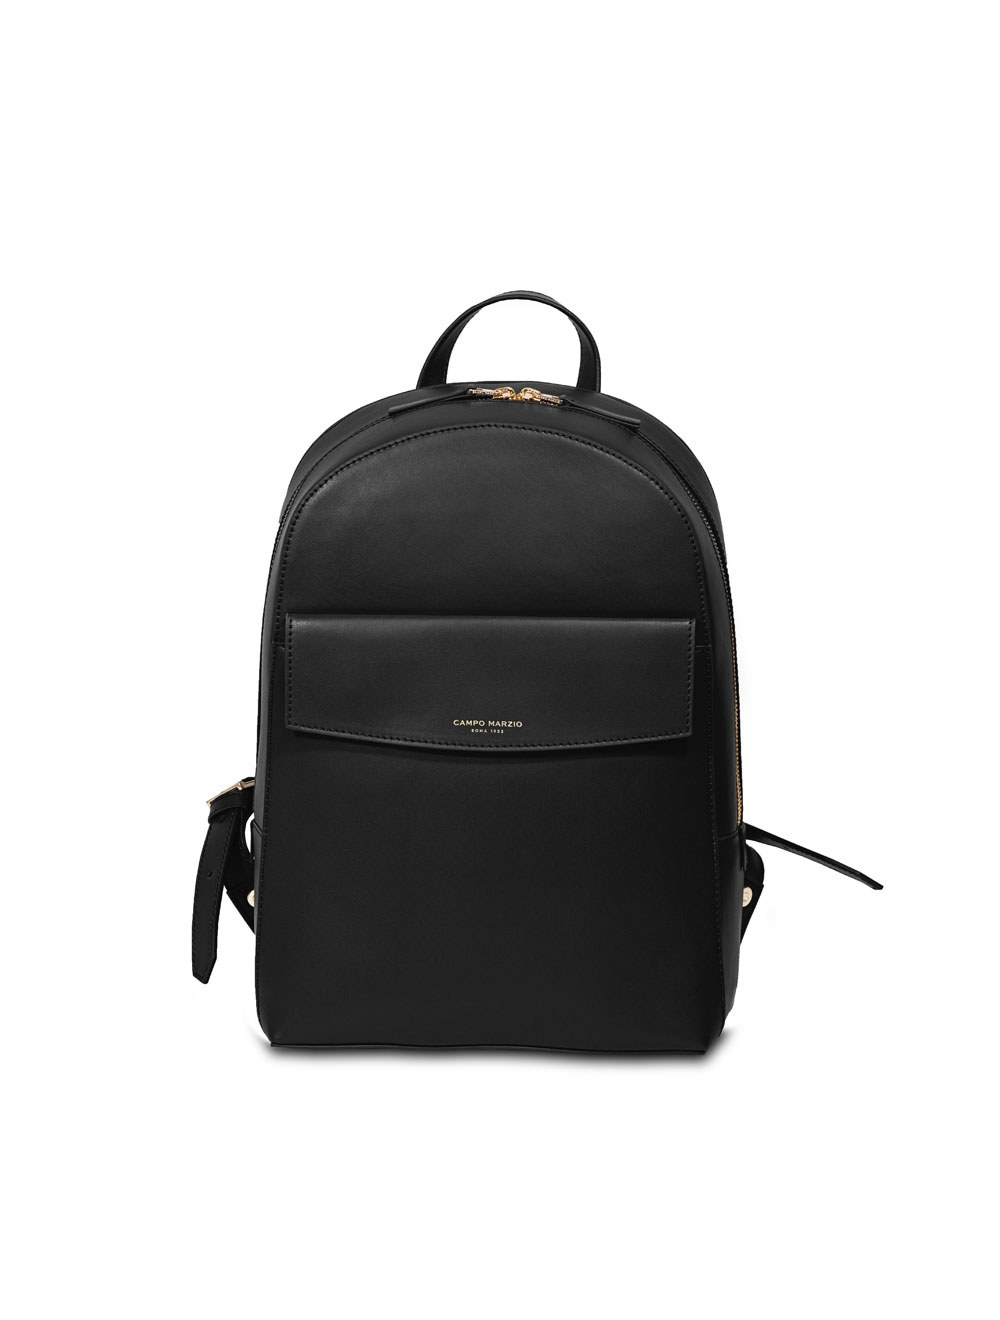 Business Backpack With Front Pocket - Black